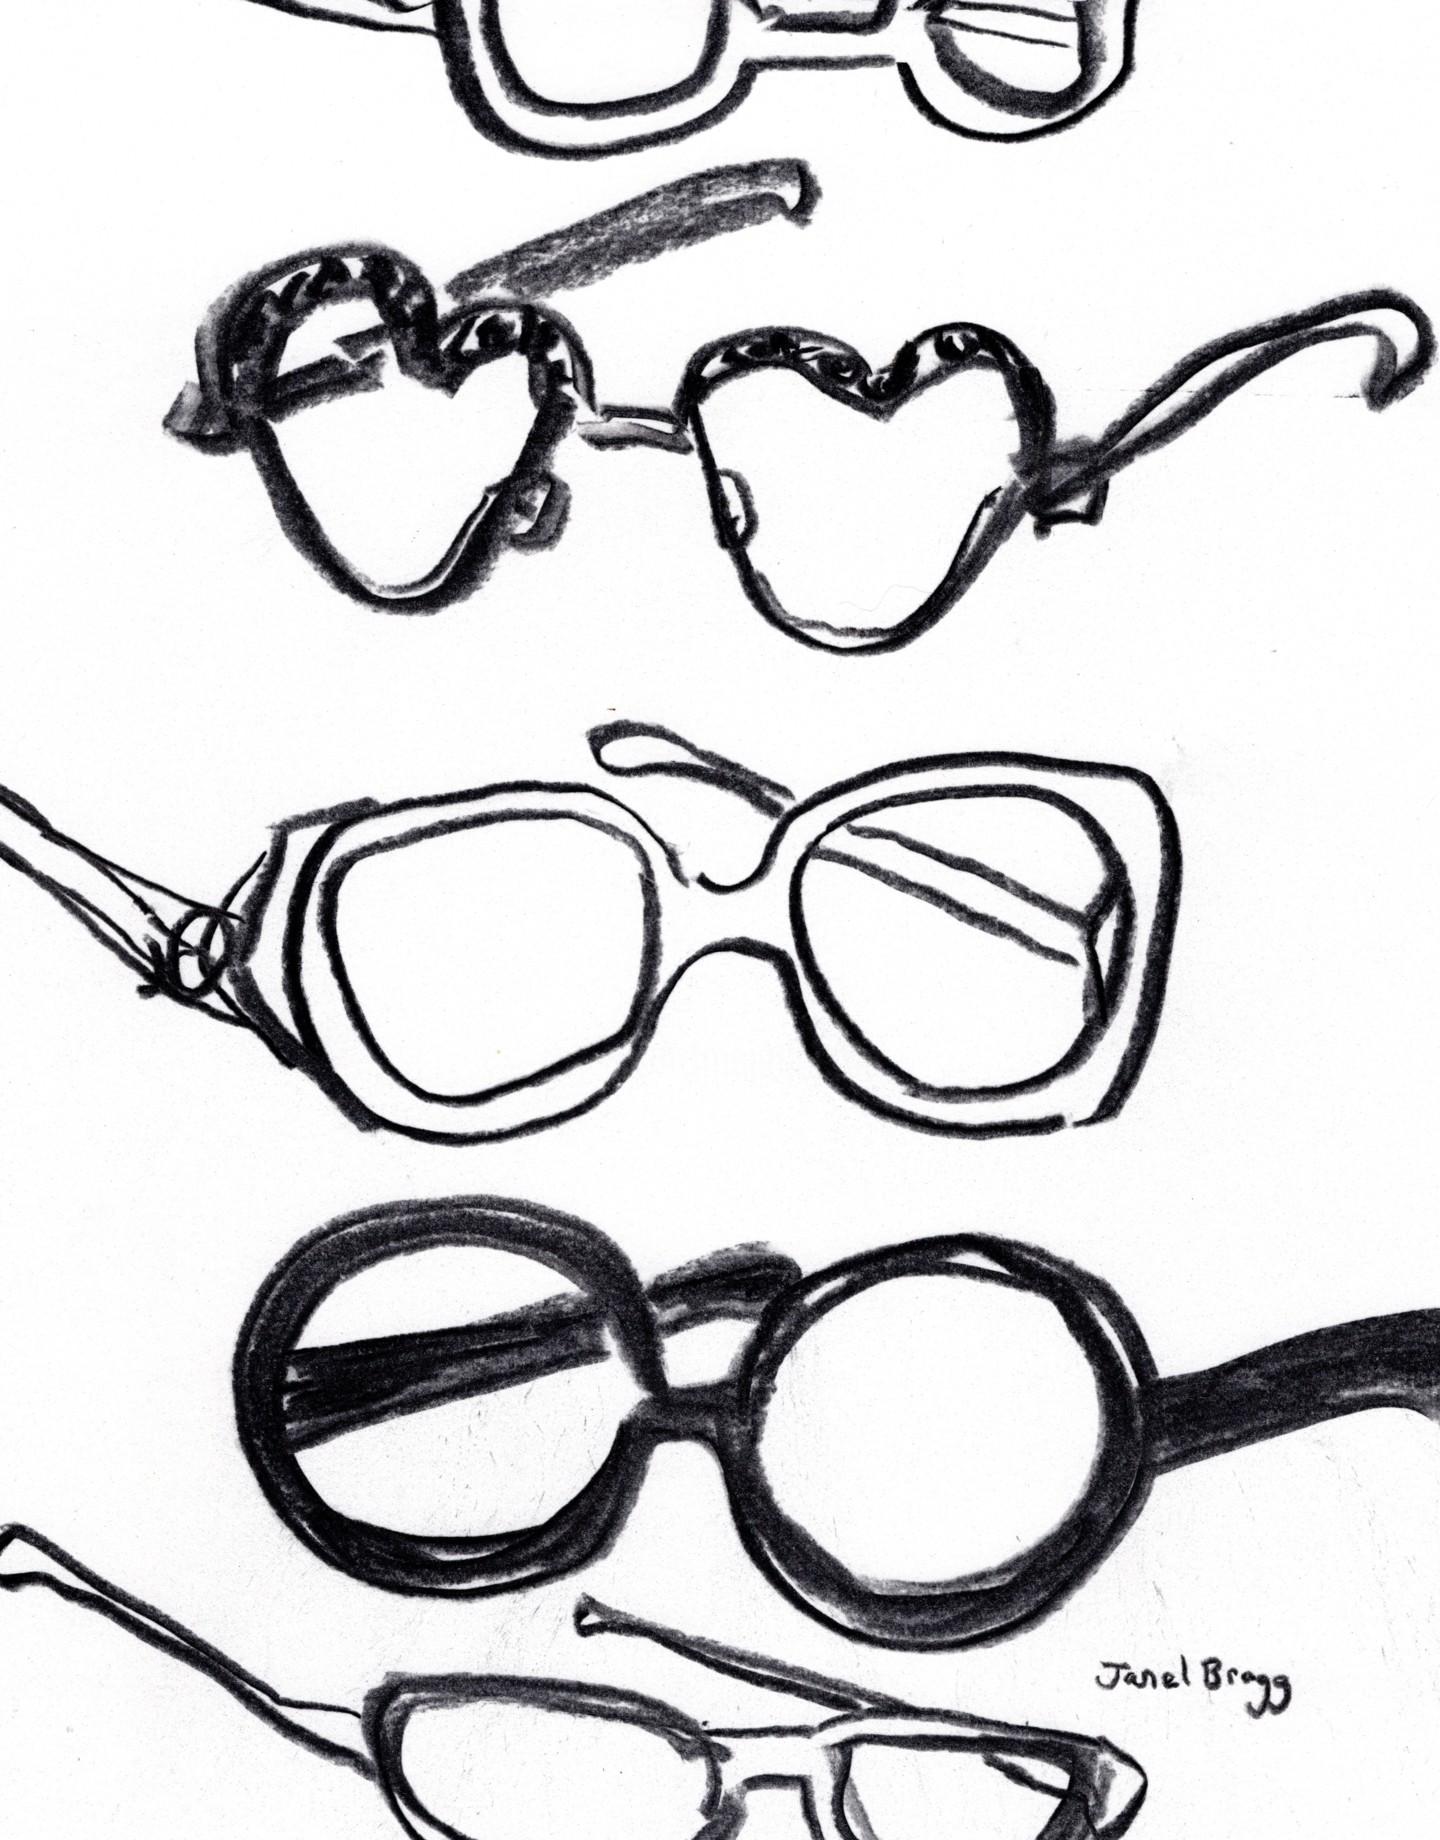 Janel Bragg - Sunglasses in Charcoal 1.5